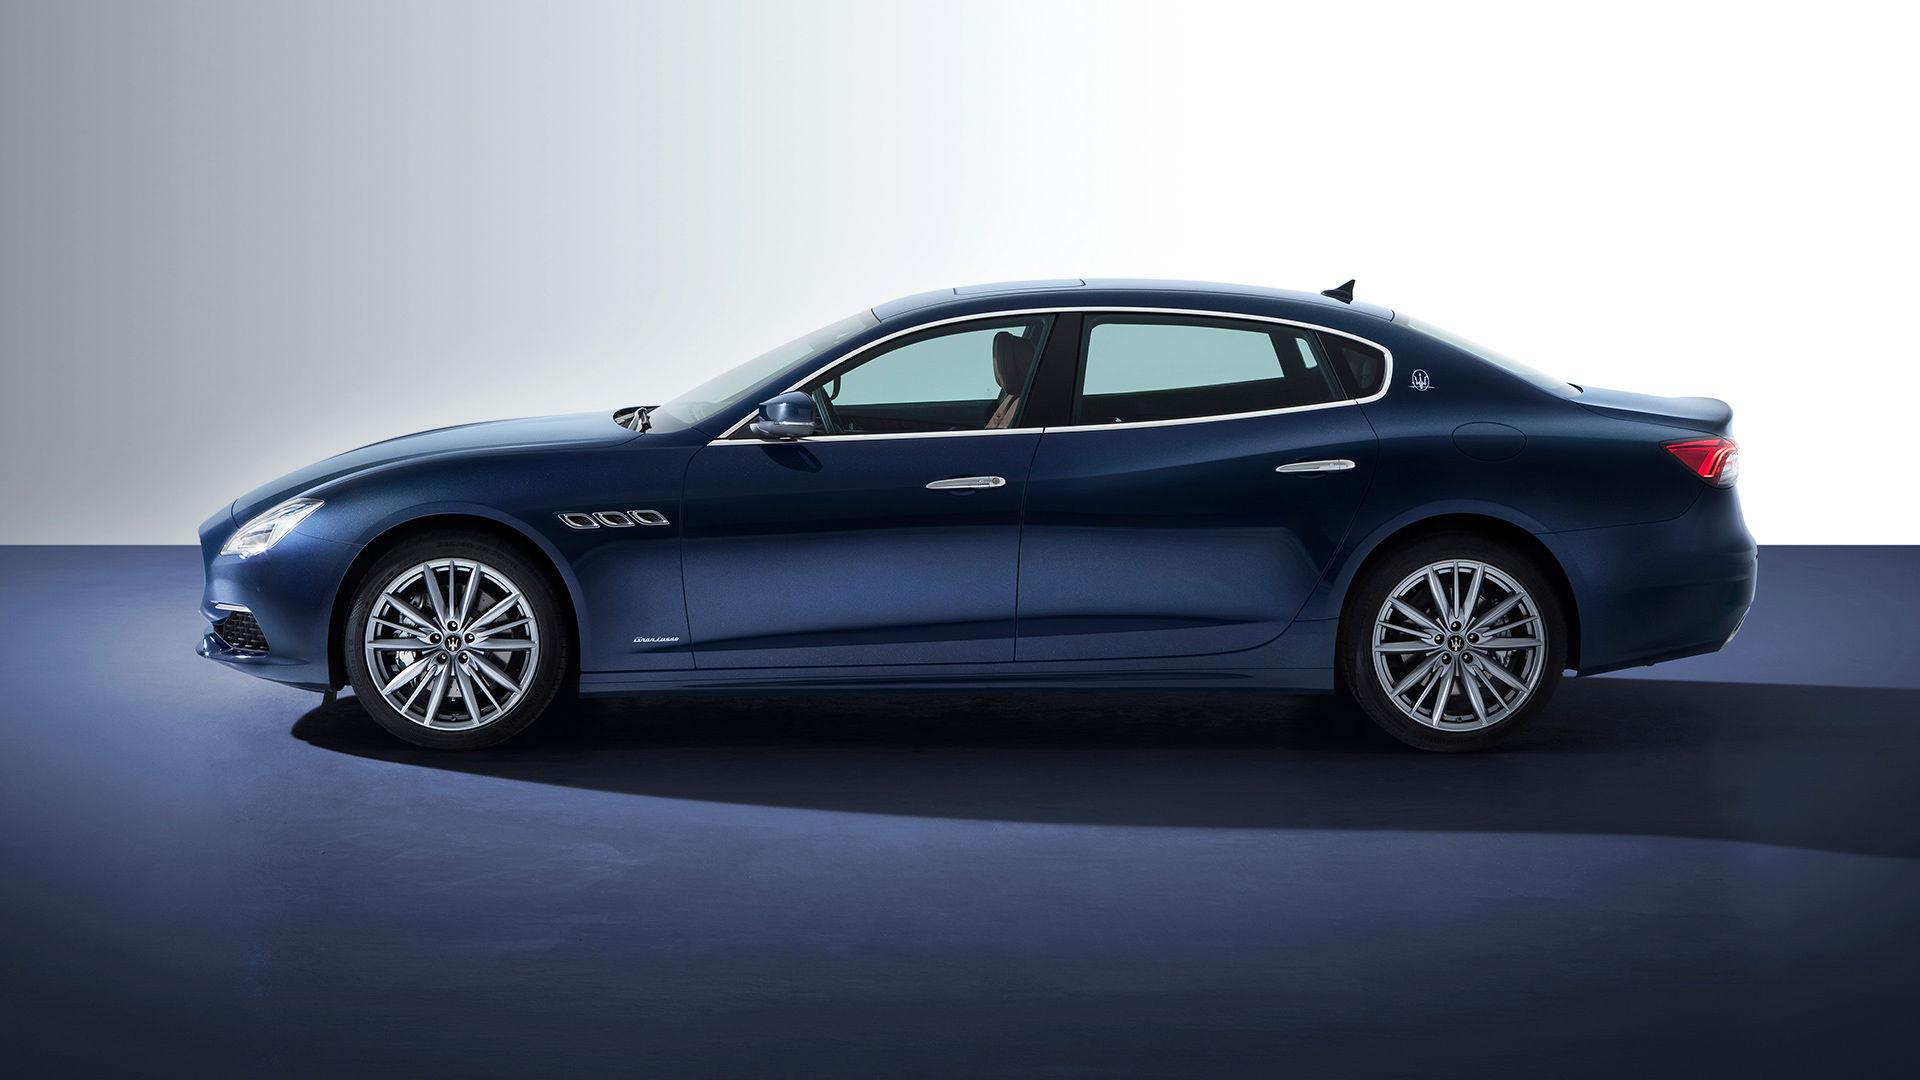 Maserati Quattroporte in Blau - Luxus-Sportlimousine